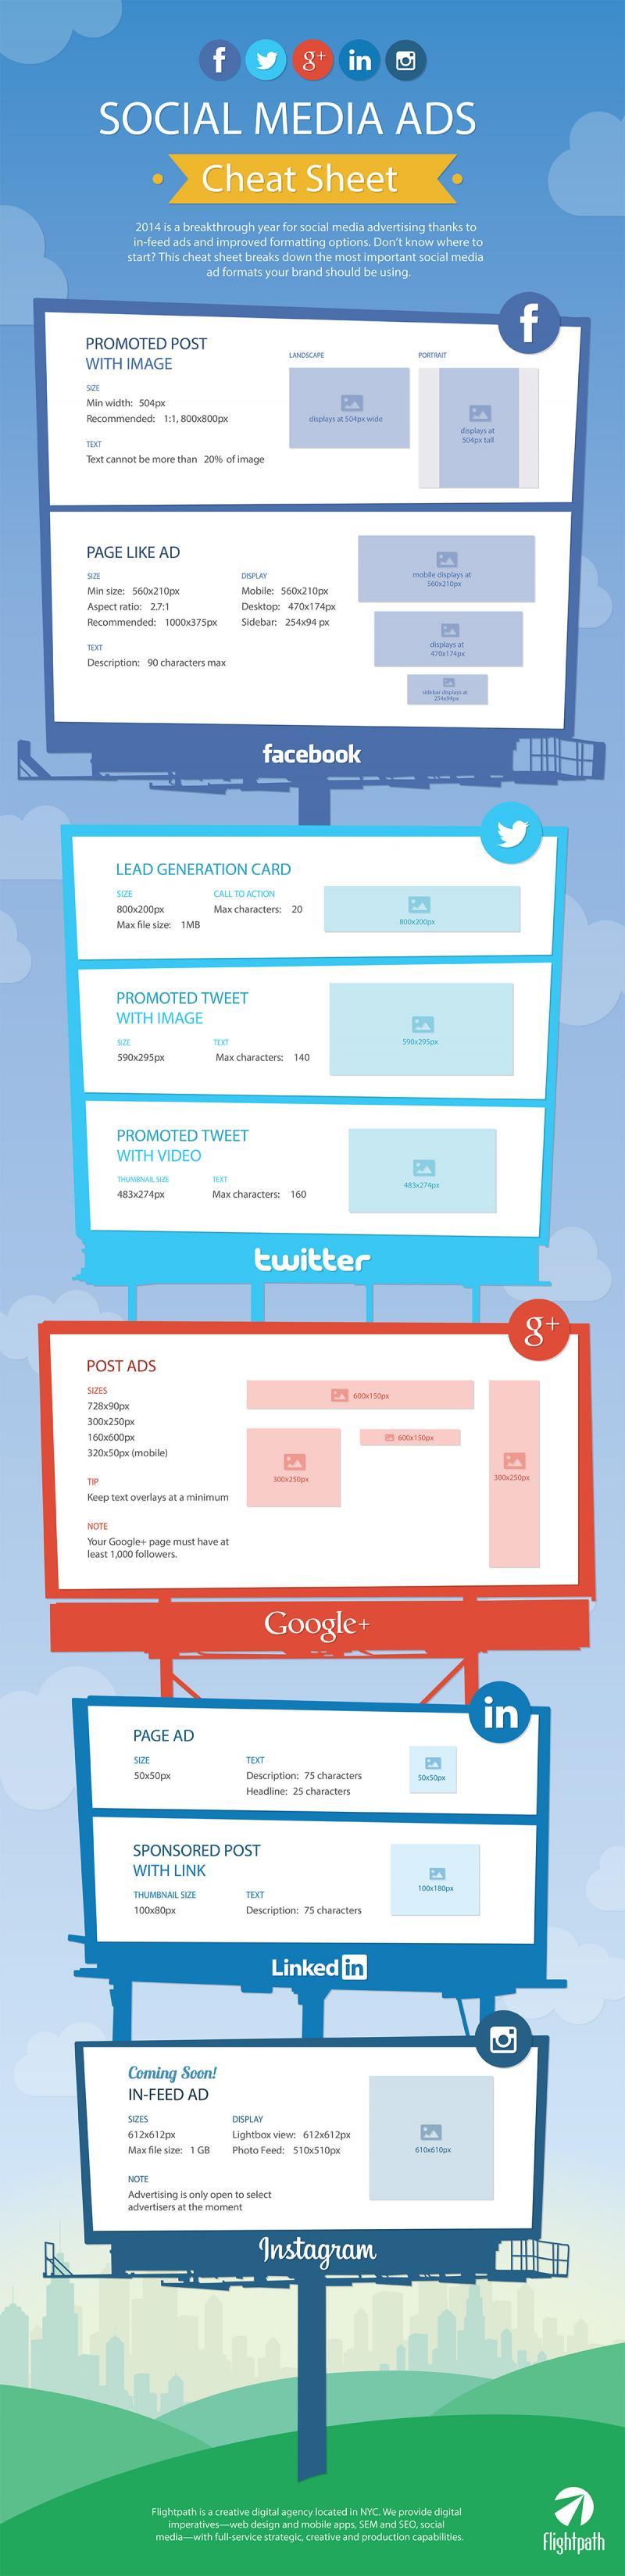 Social Media Ads Cheat Sheet: Image Sizes for Facebook, Twitter, Instagram & More #Infographics